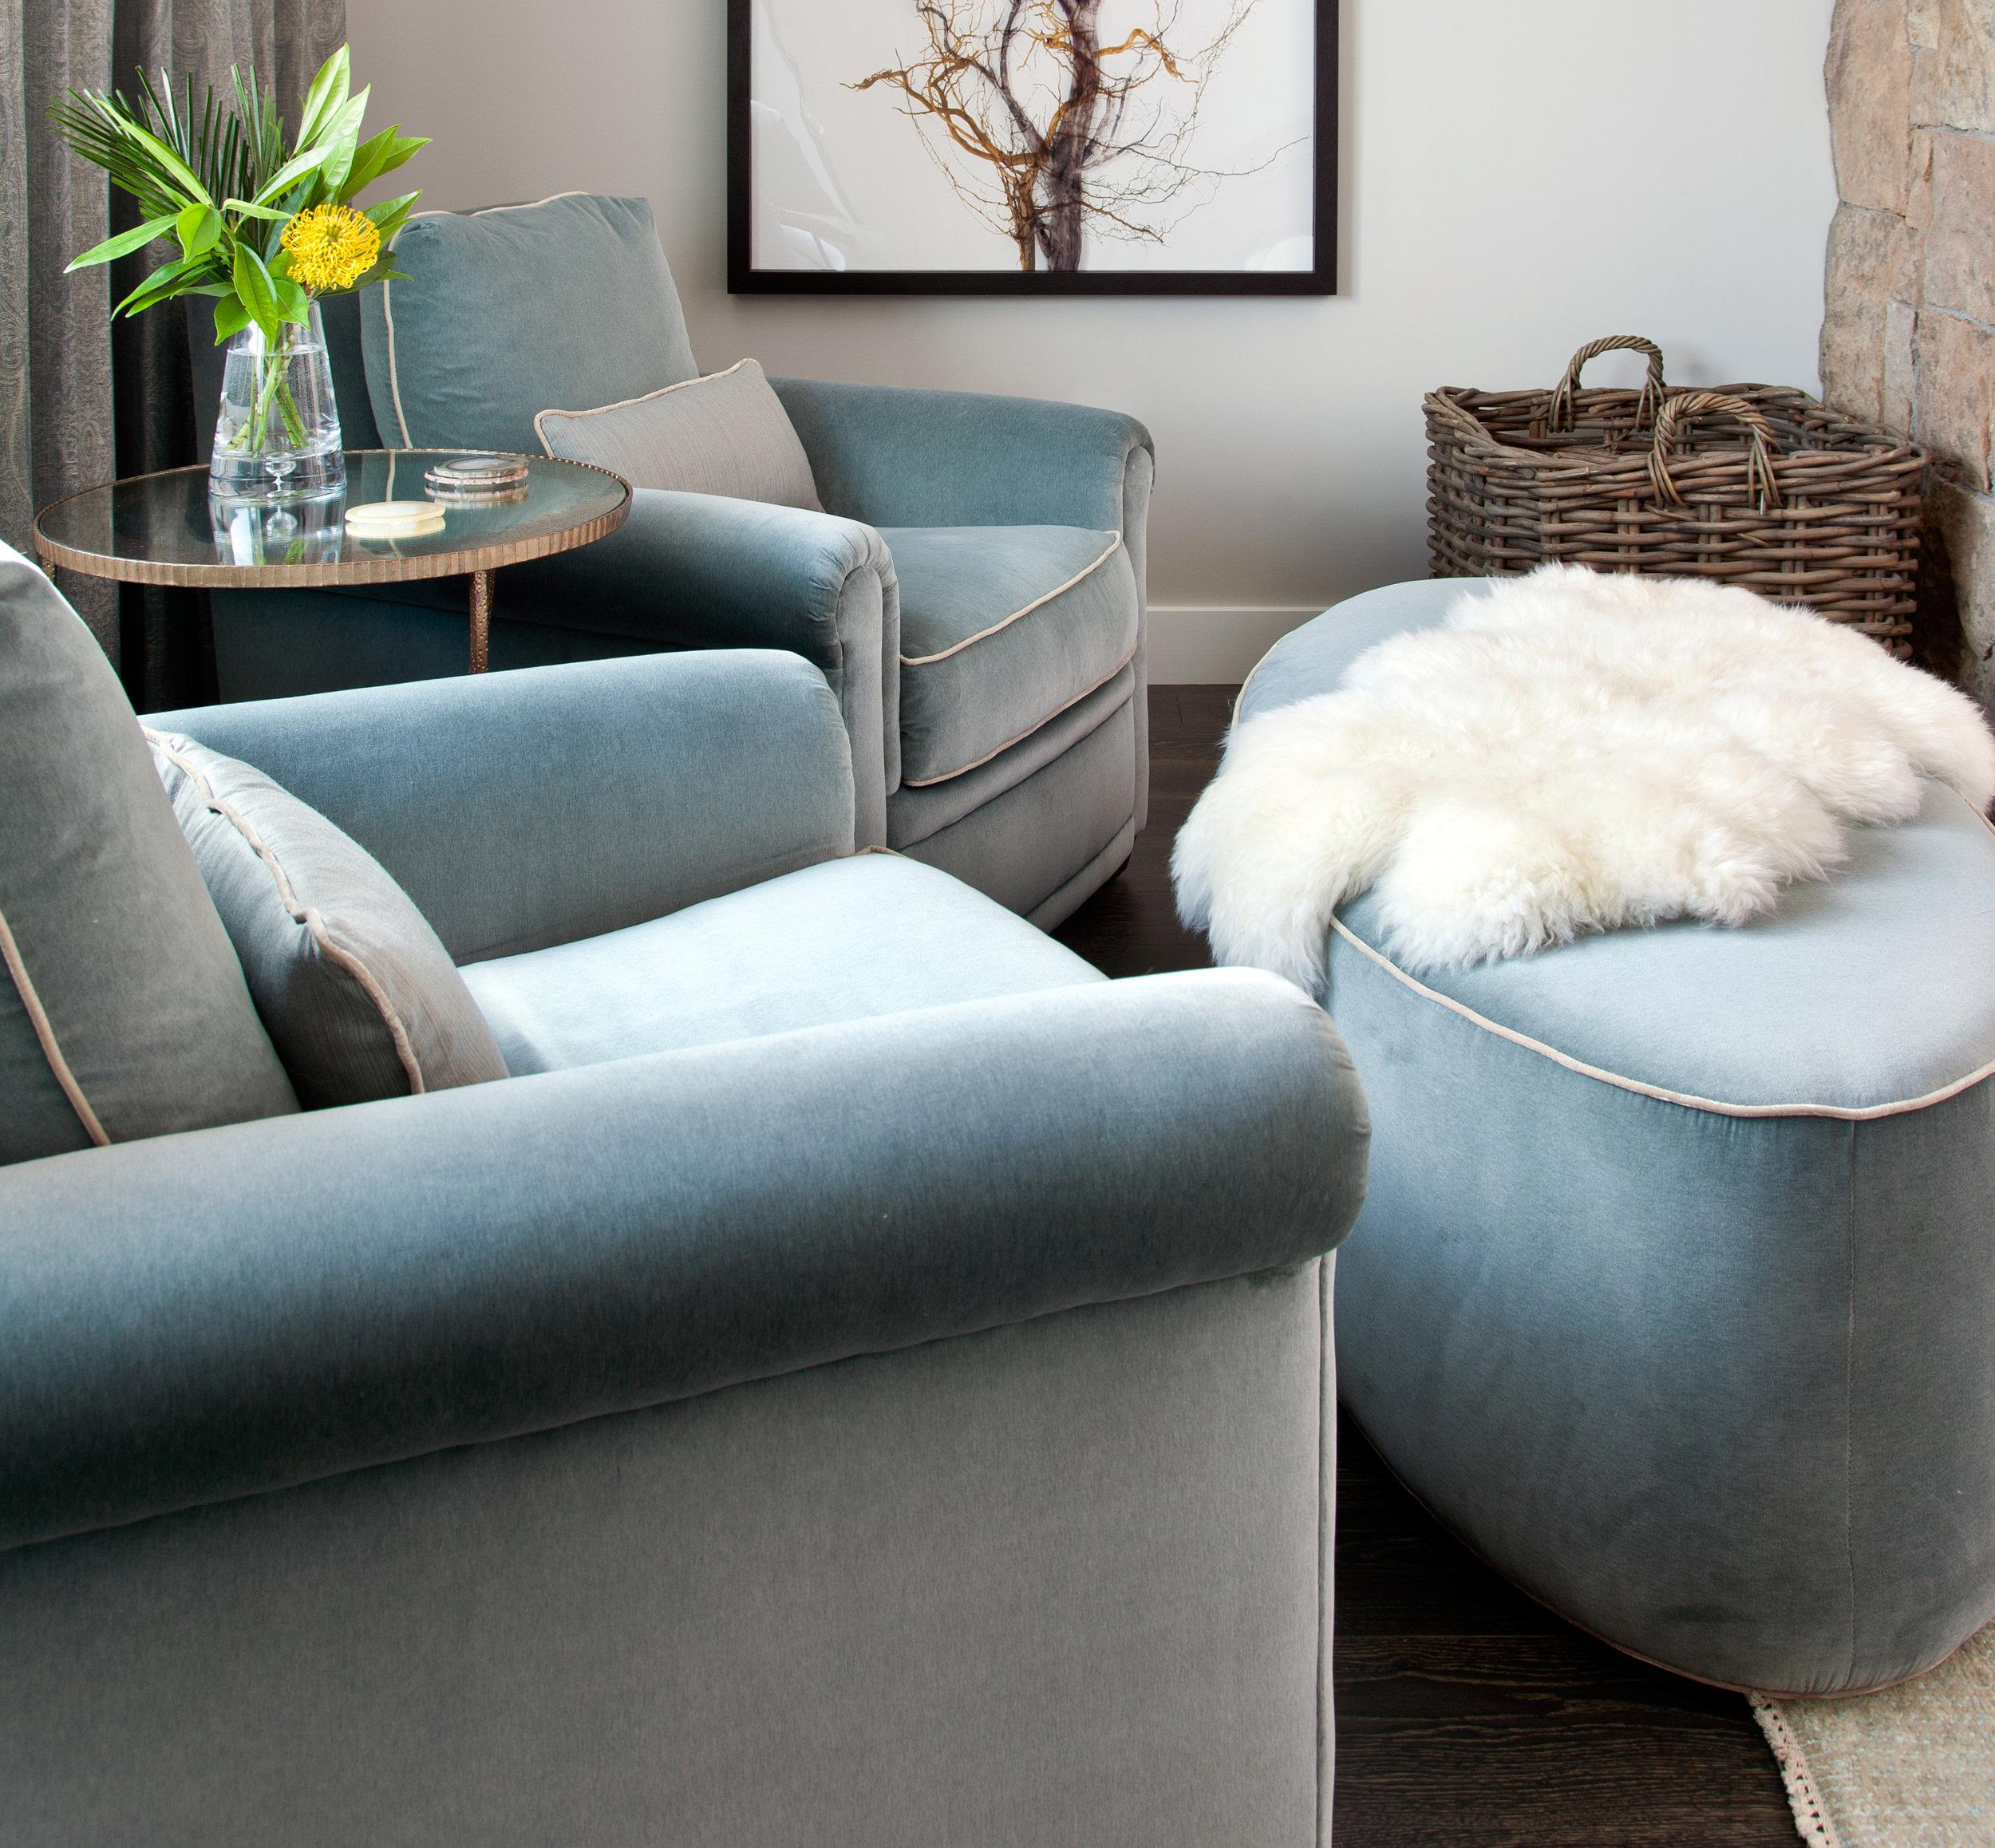 Custom Side Chairs   by JJ Custom |   Bacan Porpoise     Velvet Fabric   by Fortuny